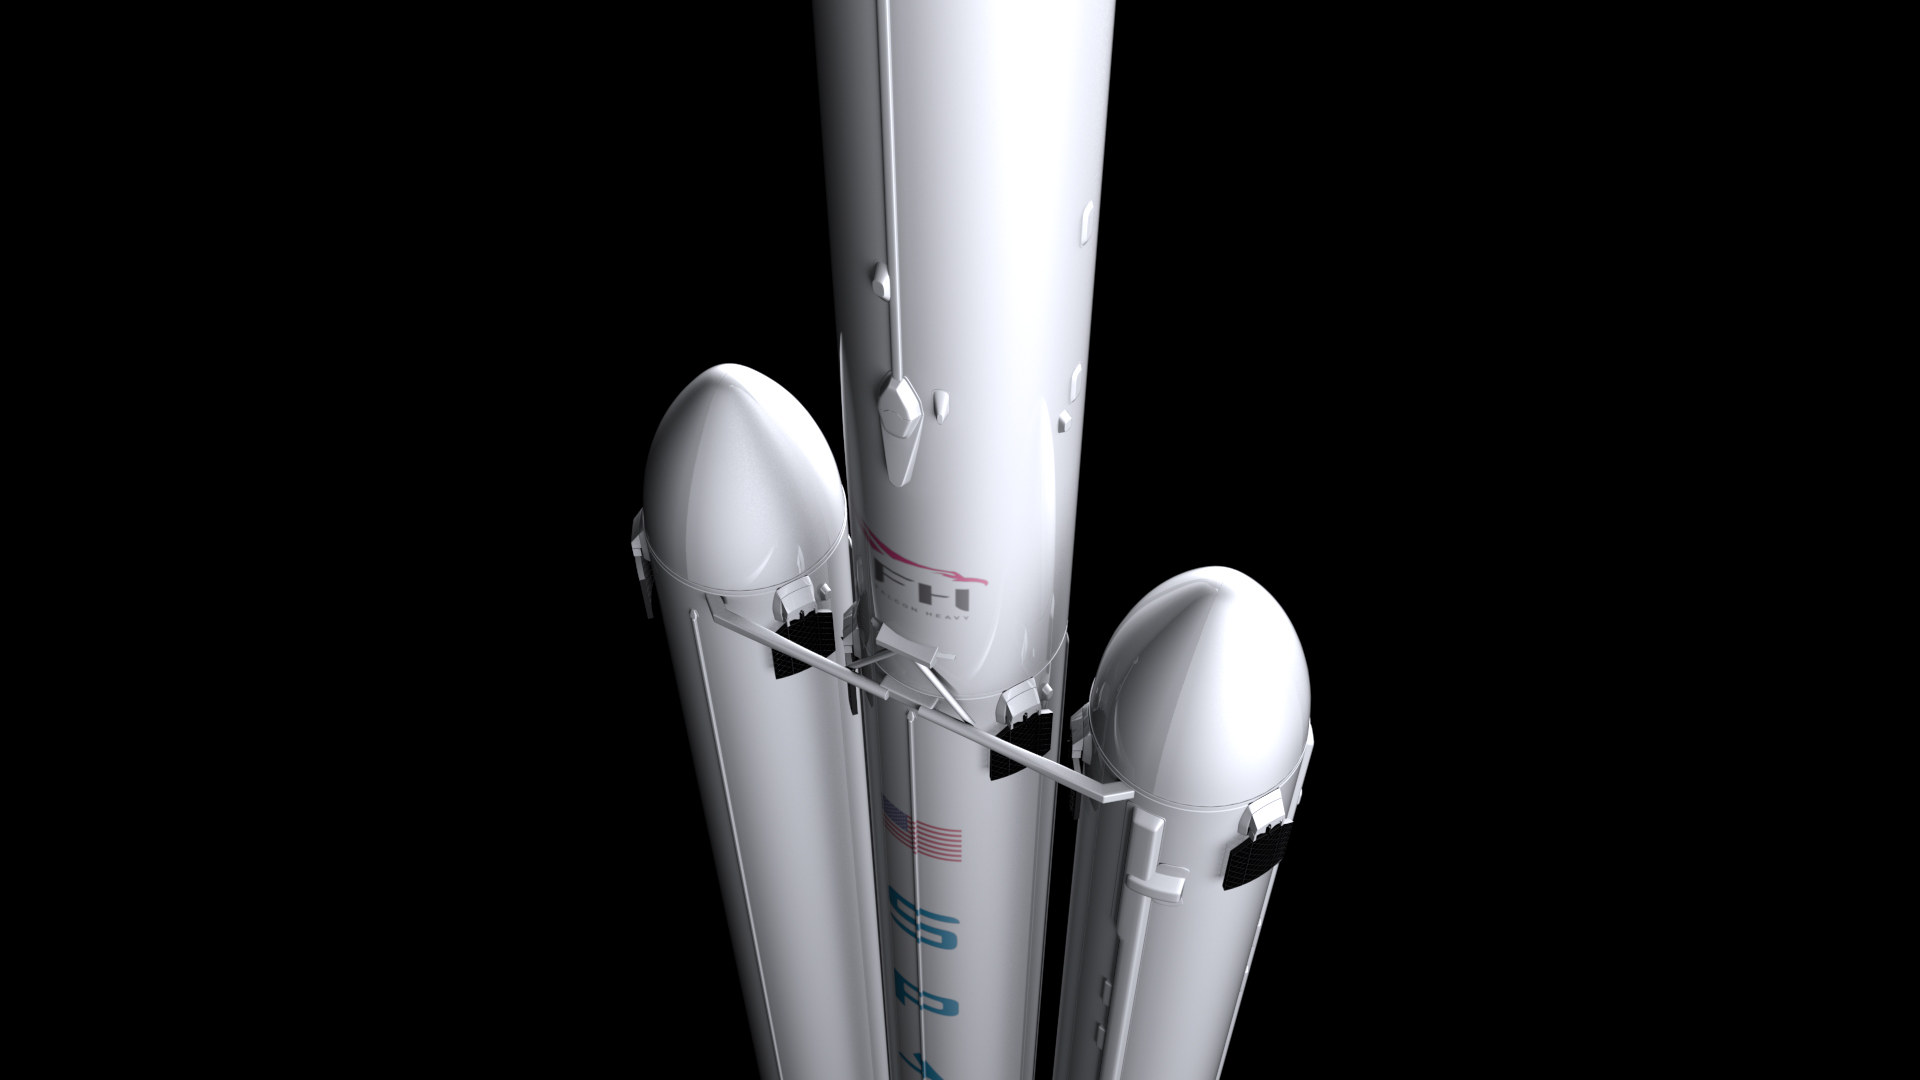 falcon heavy v1.2 3d model max fbx c4d lwo ma mb hrc xsi obj 277813